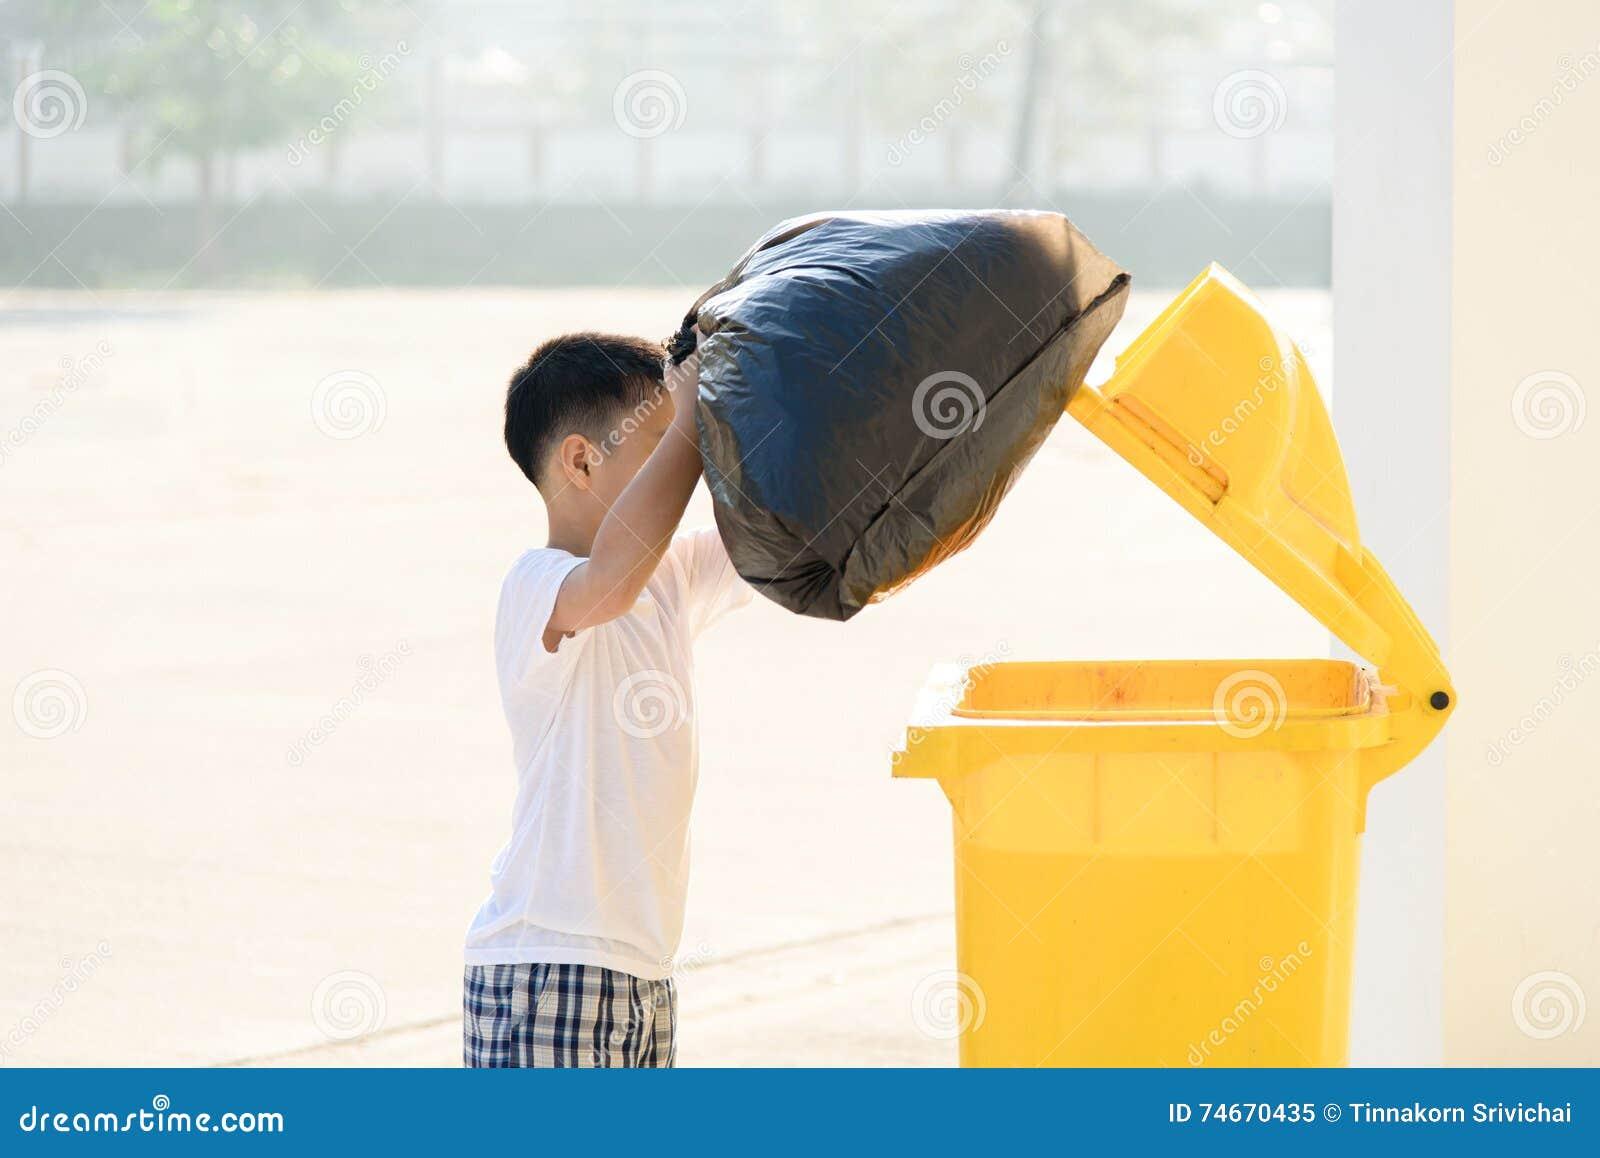 Boy carry garbage